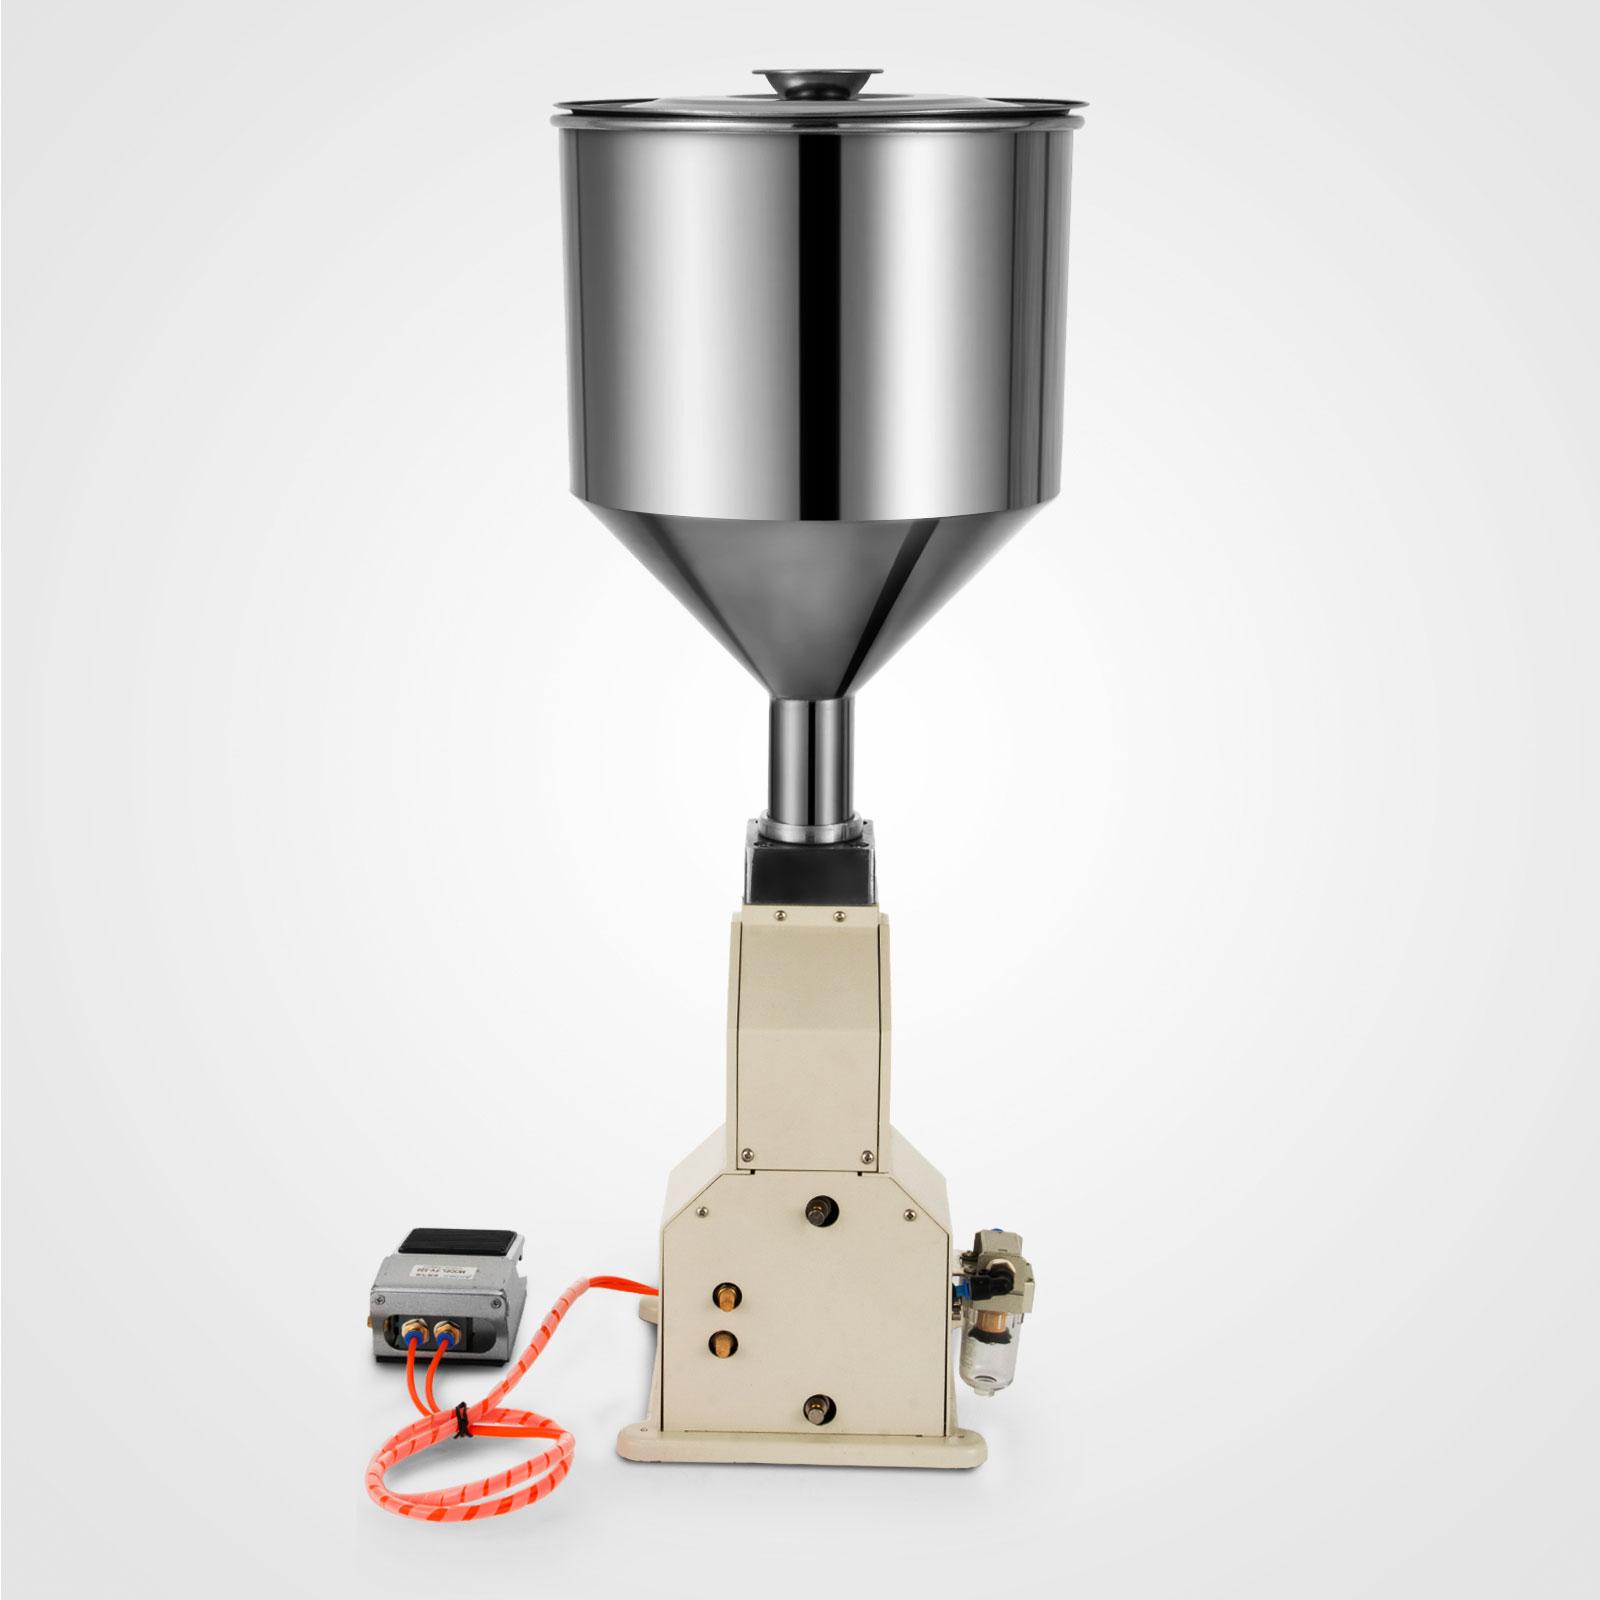 Liquid-Filling-Machine-Filler-Remplissage-2-3500ML-50-500ML-INDUSTRY-SUPPLY miniature 55